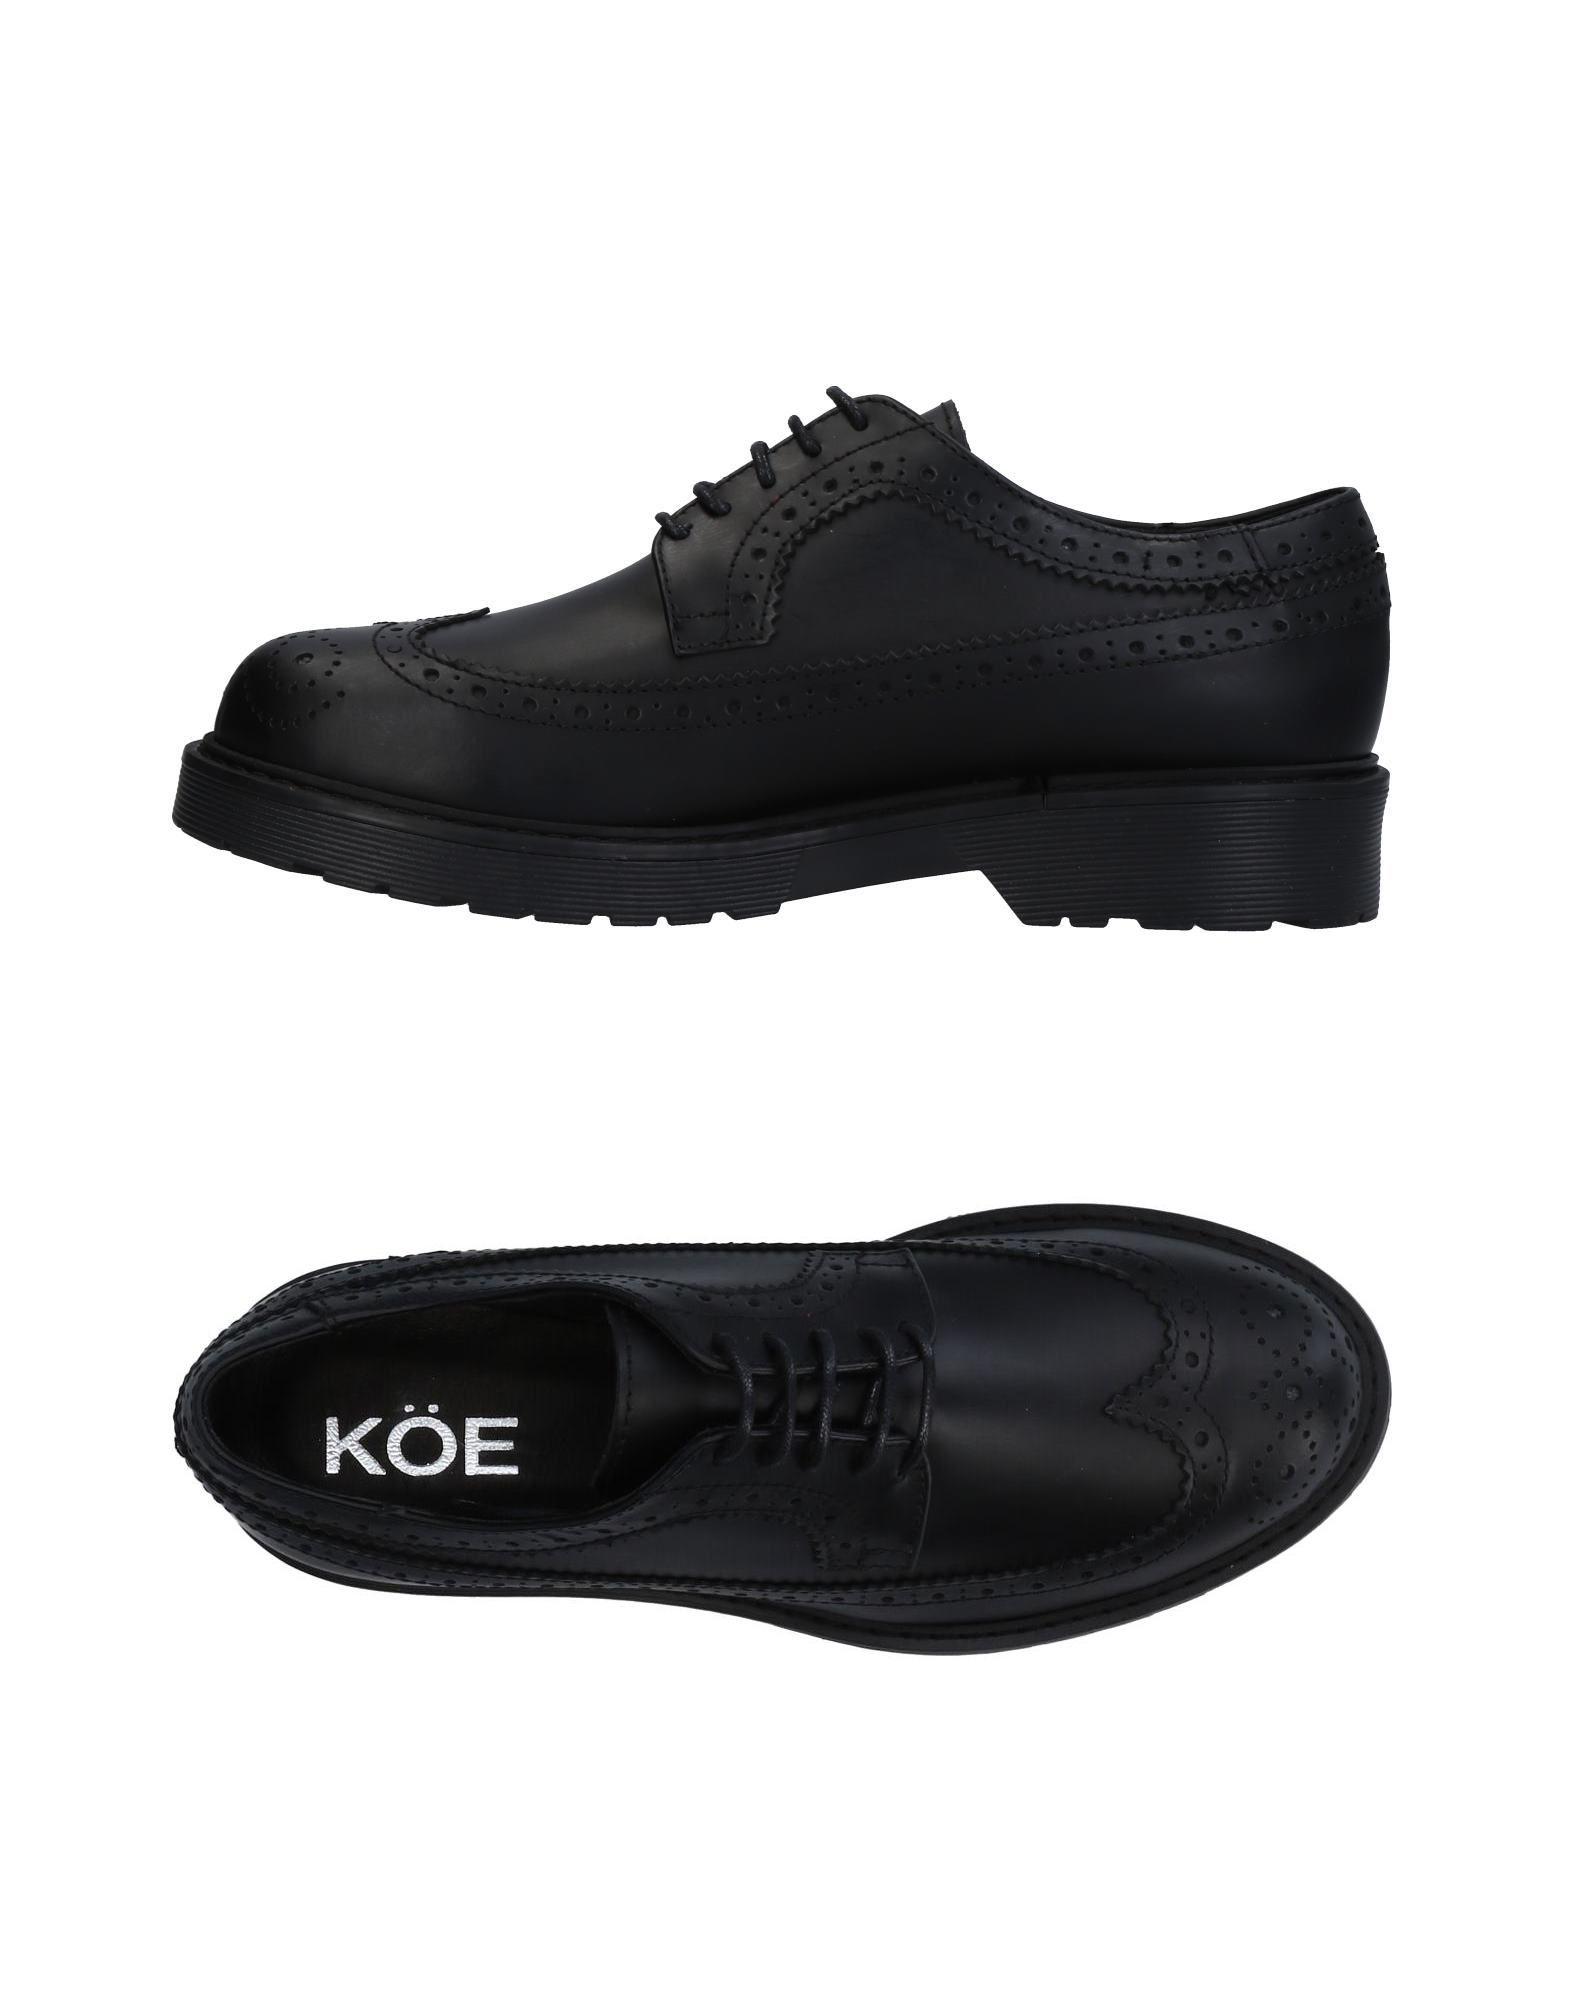 Фото - KÖE Обувь на шнурках обувь на высокой платформе dkny